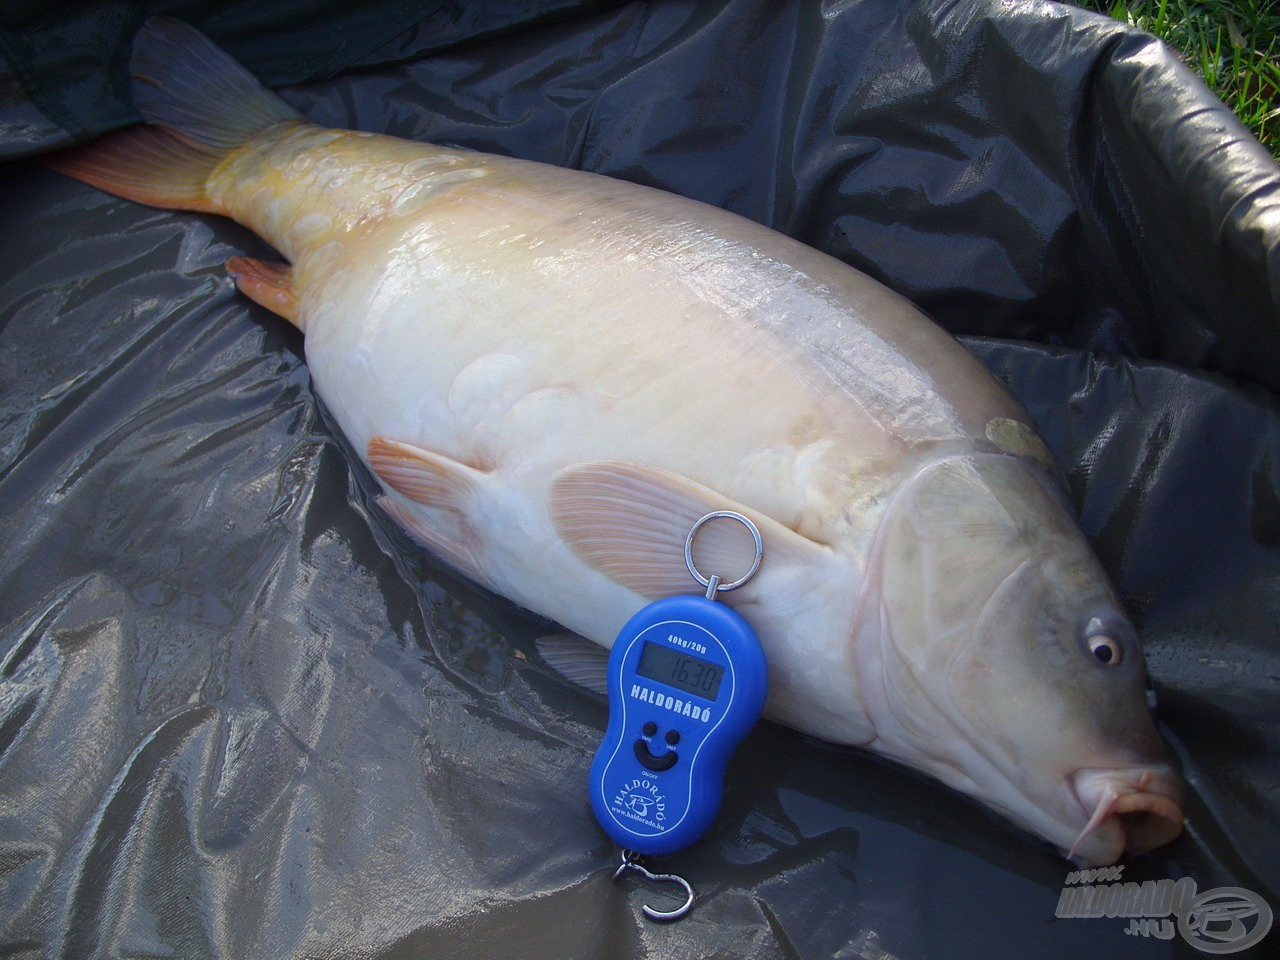 A termetes hal 16,30 kilogrammig terhelte mérlegemet